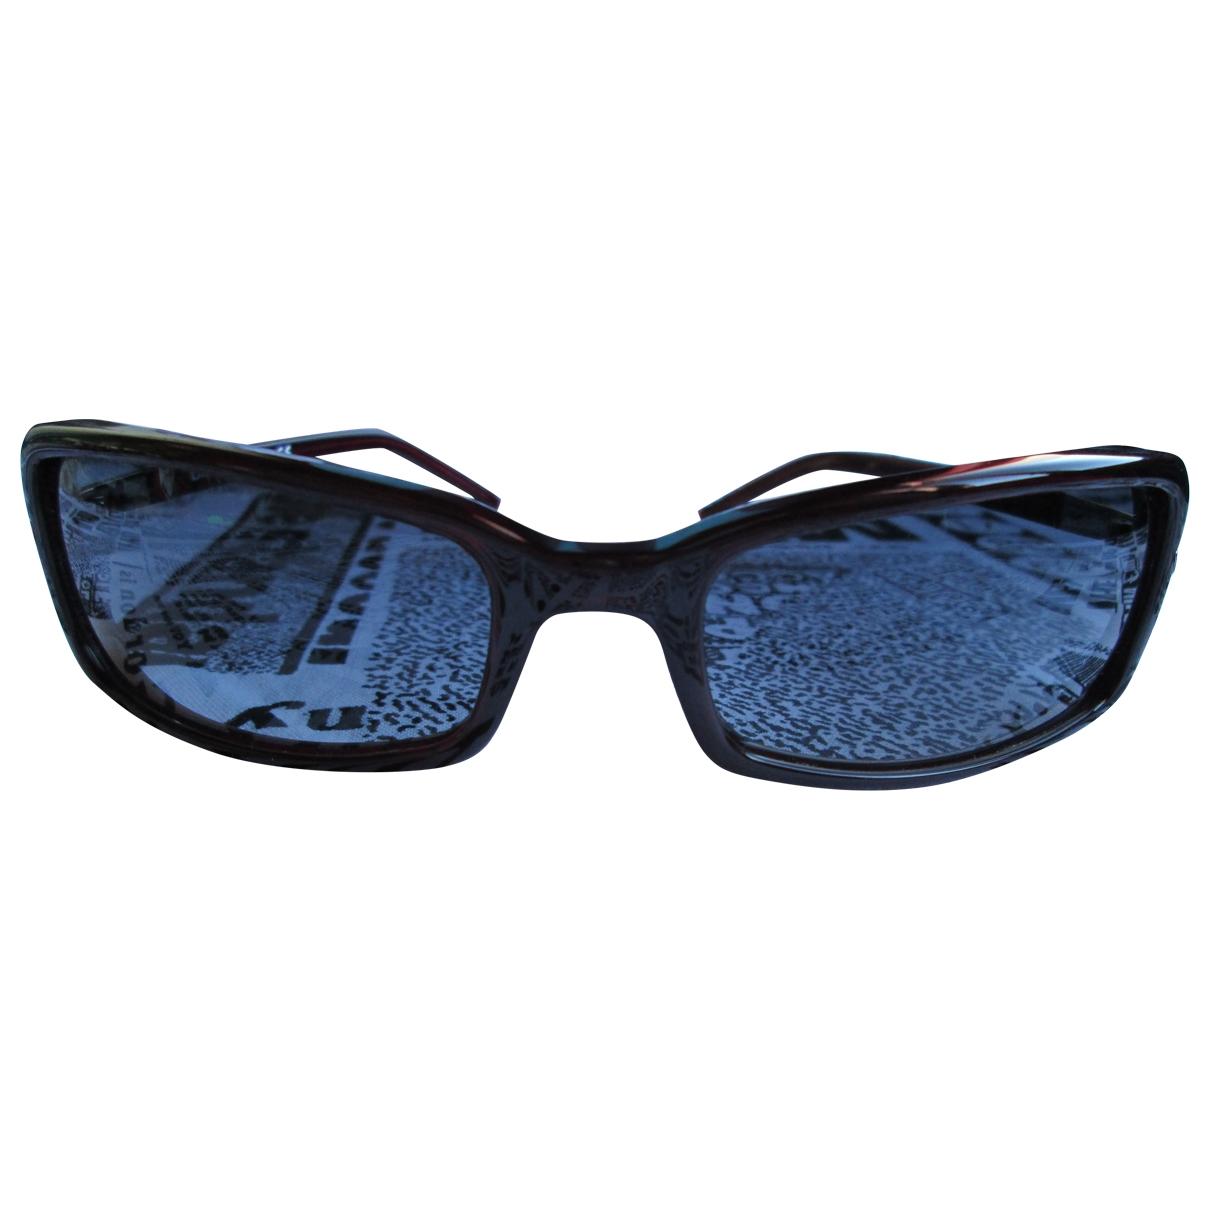 Dkny \N Burgundy Sunglasses for Women \N